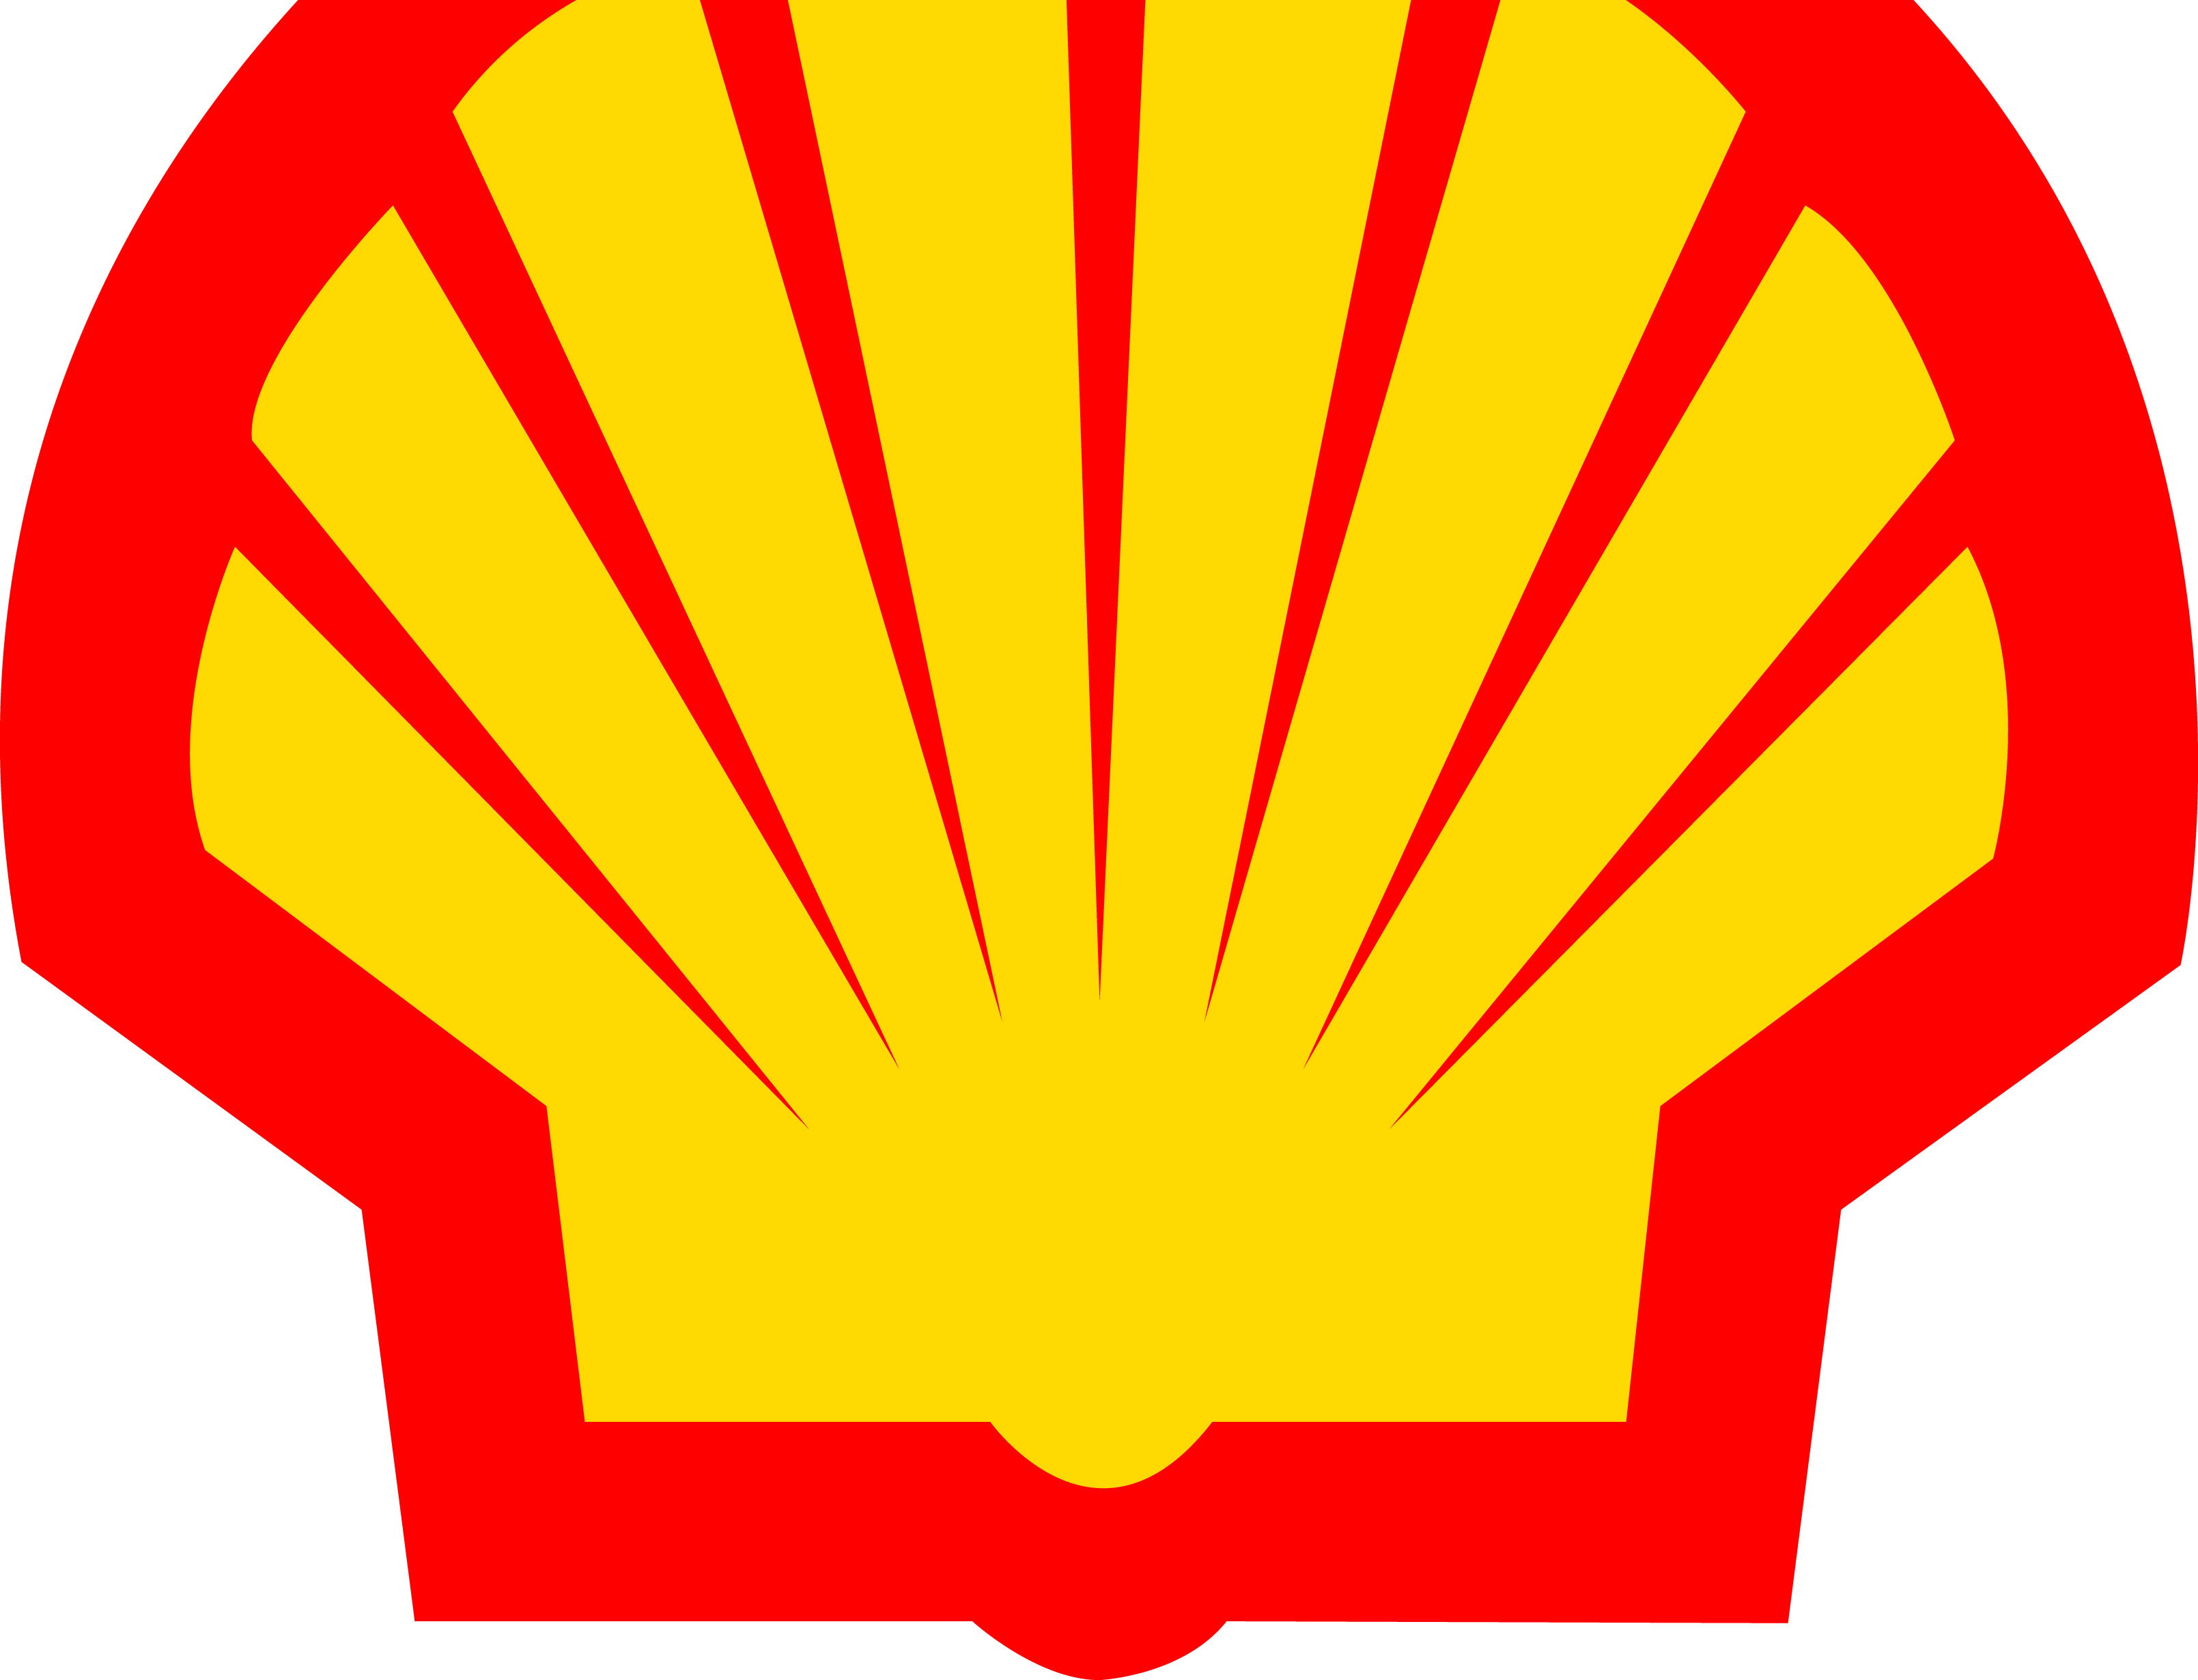 Shell Logos